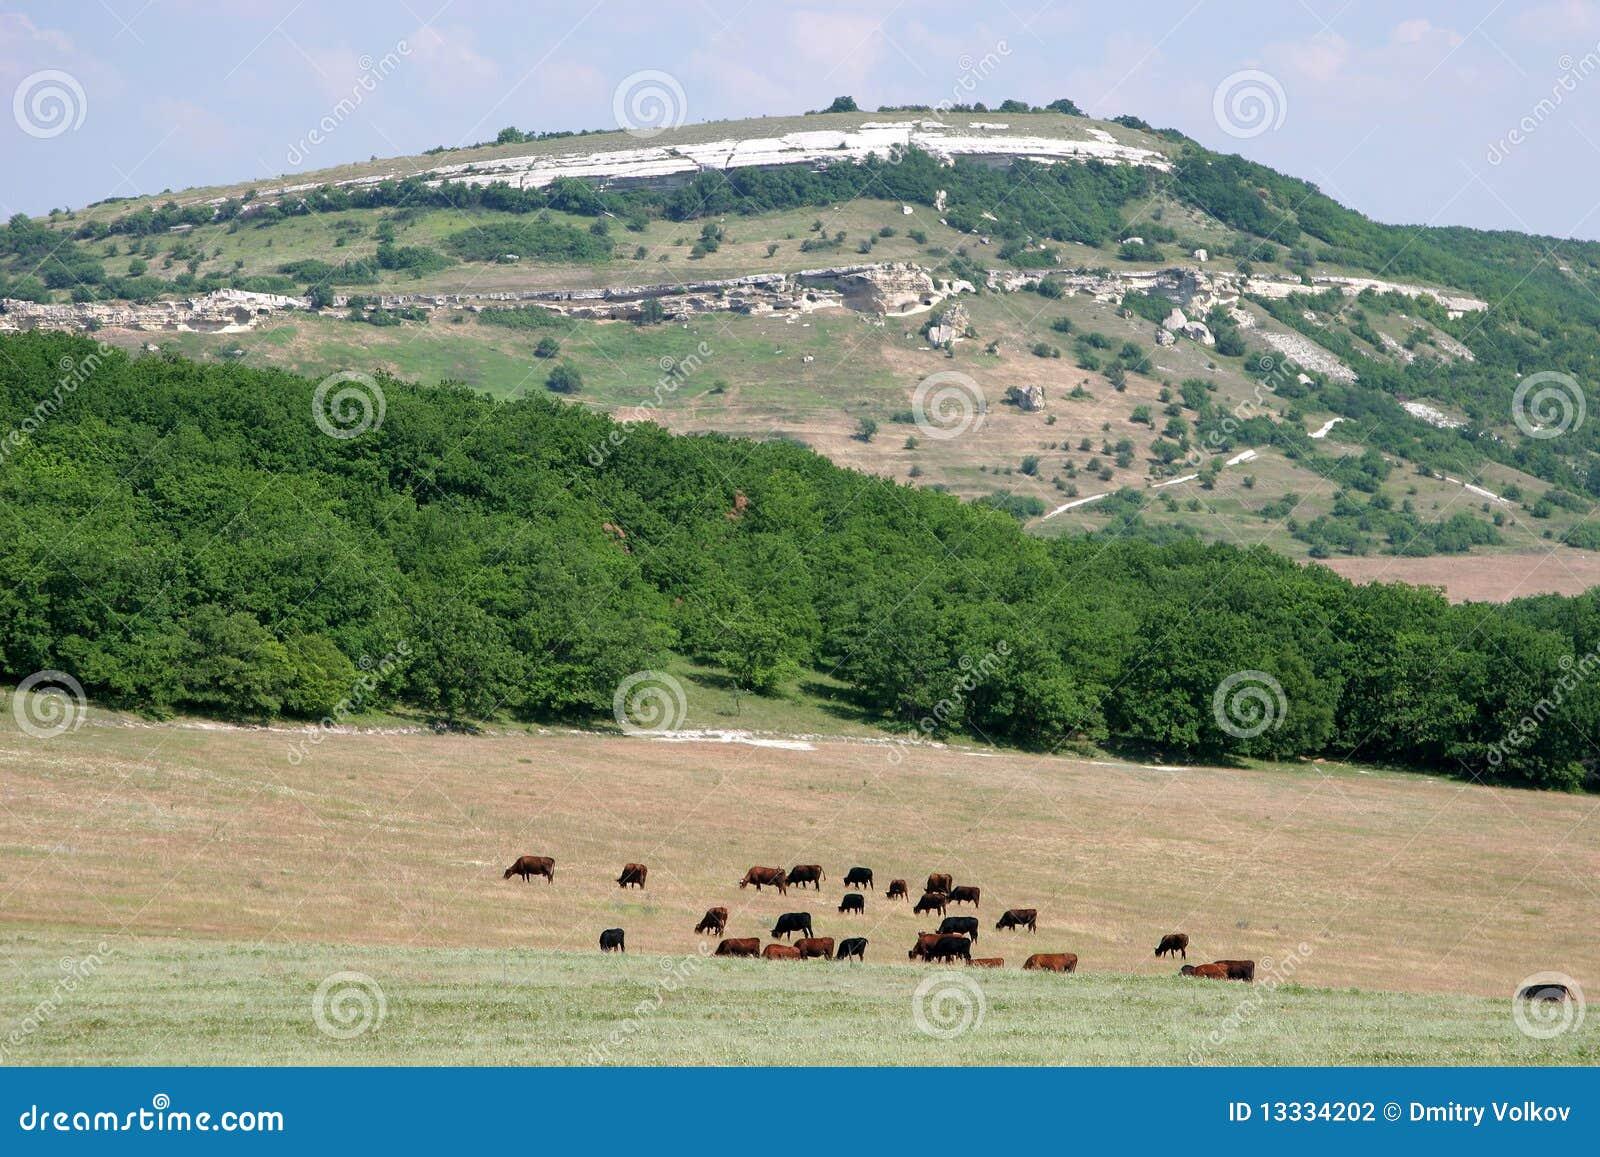 Krowy kształtują teren górę